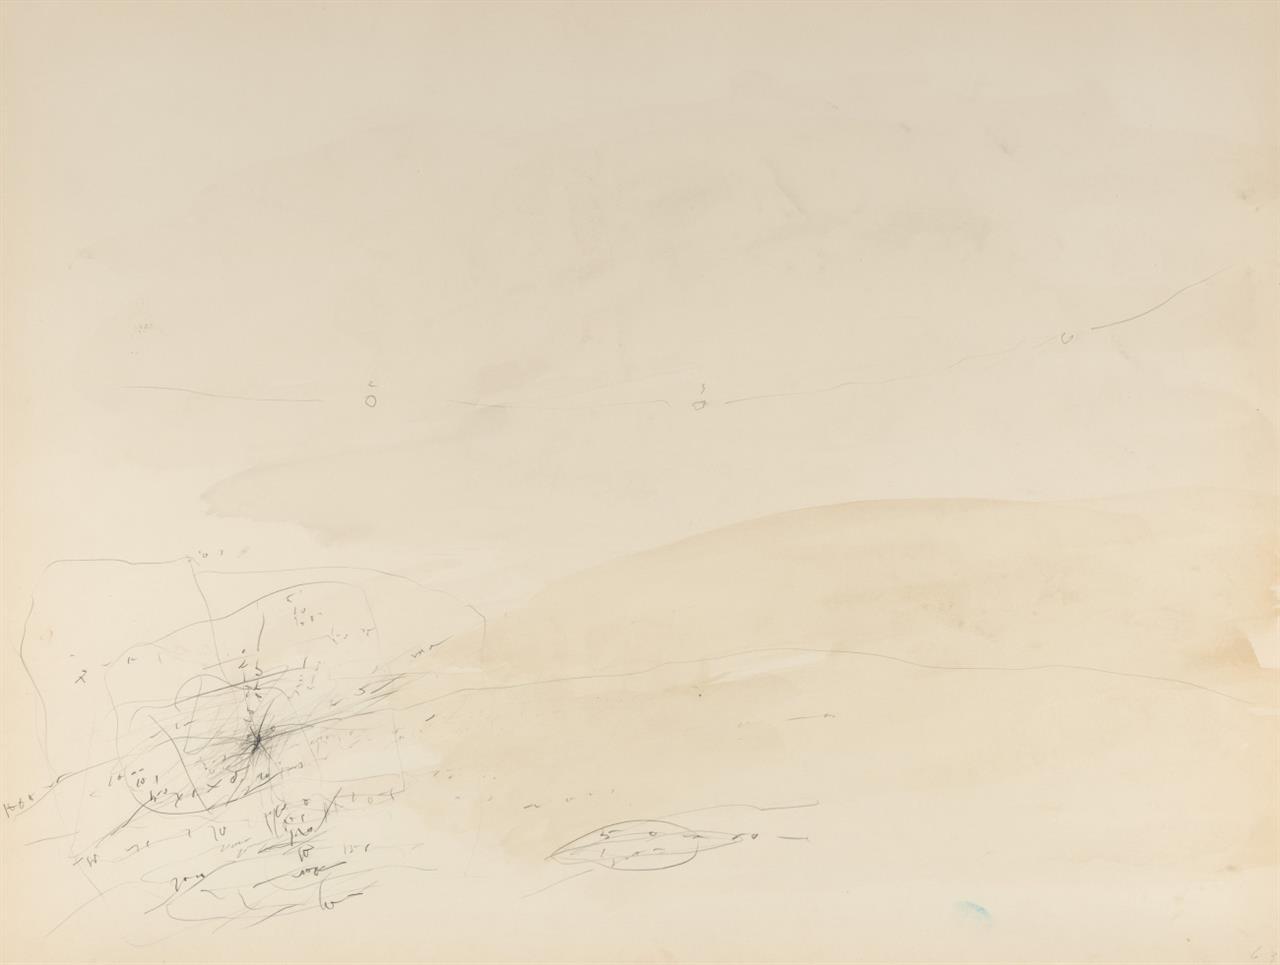 Karl Bohrmann. Ohne Titel. 1963. Bleistift und Aquarell.